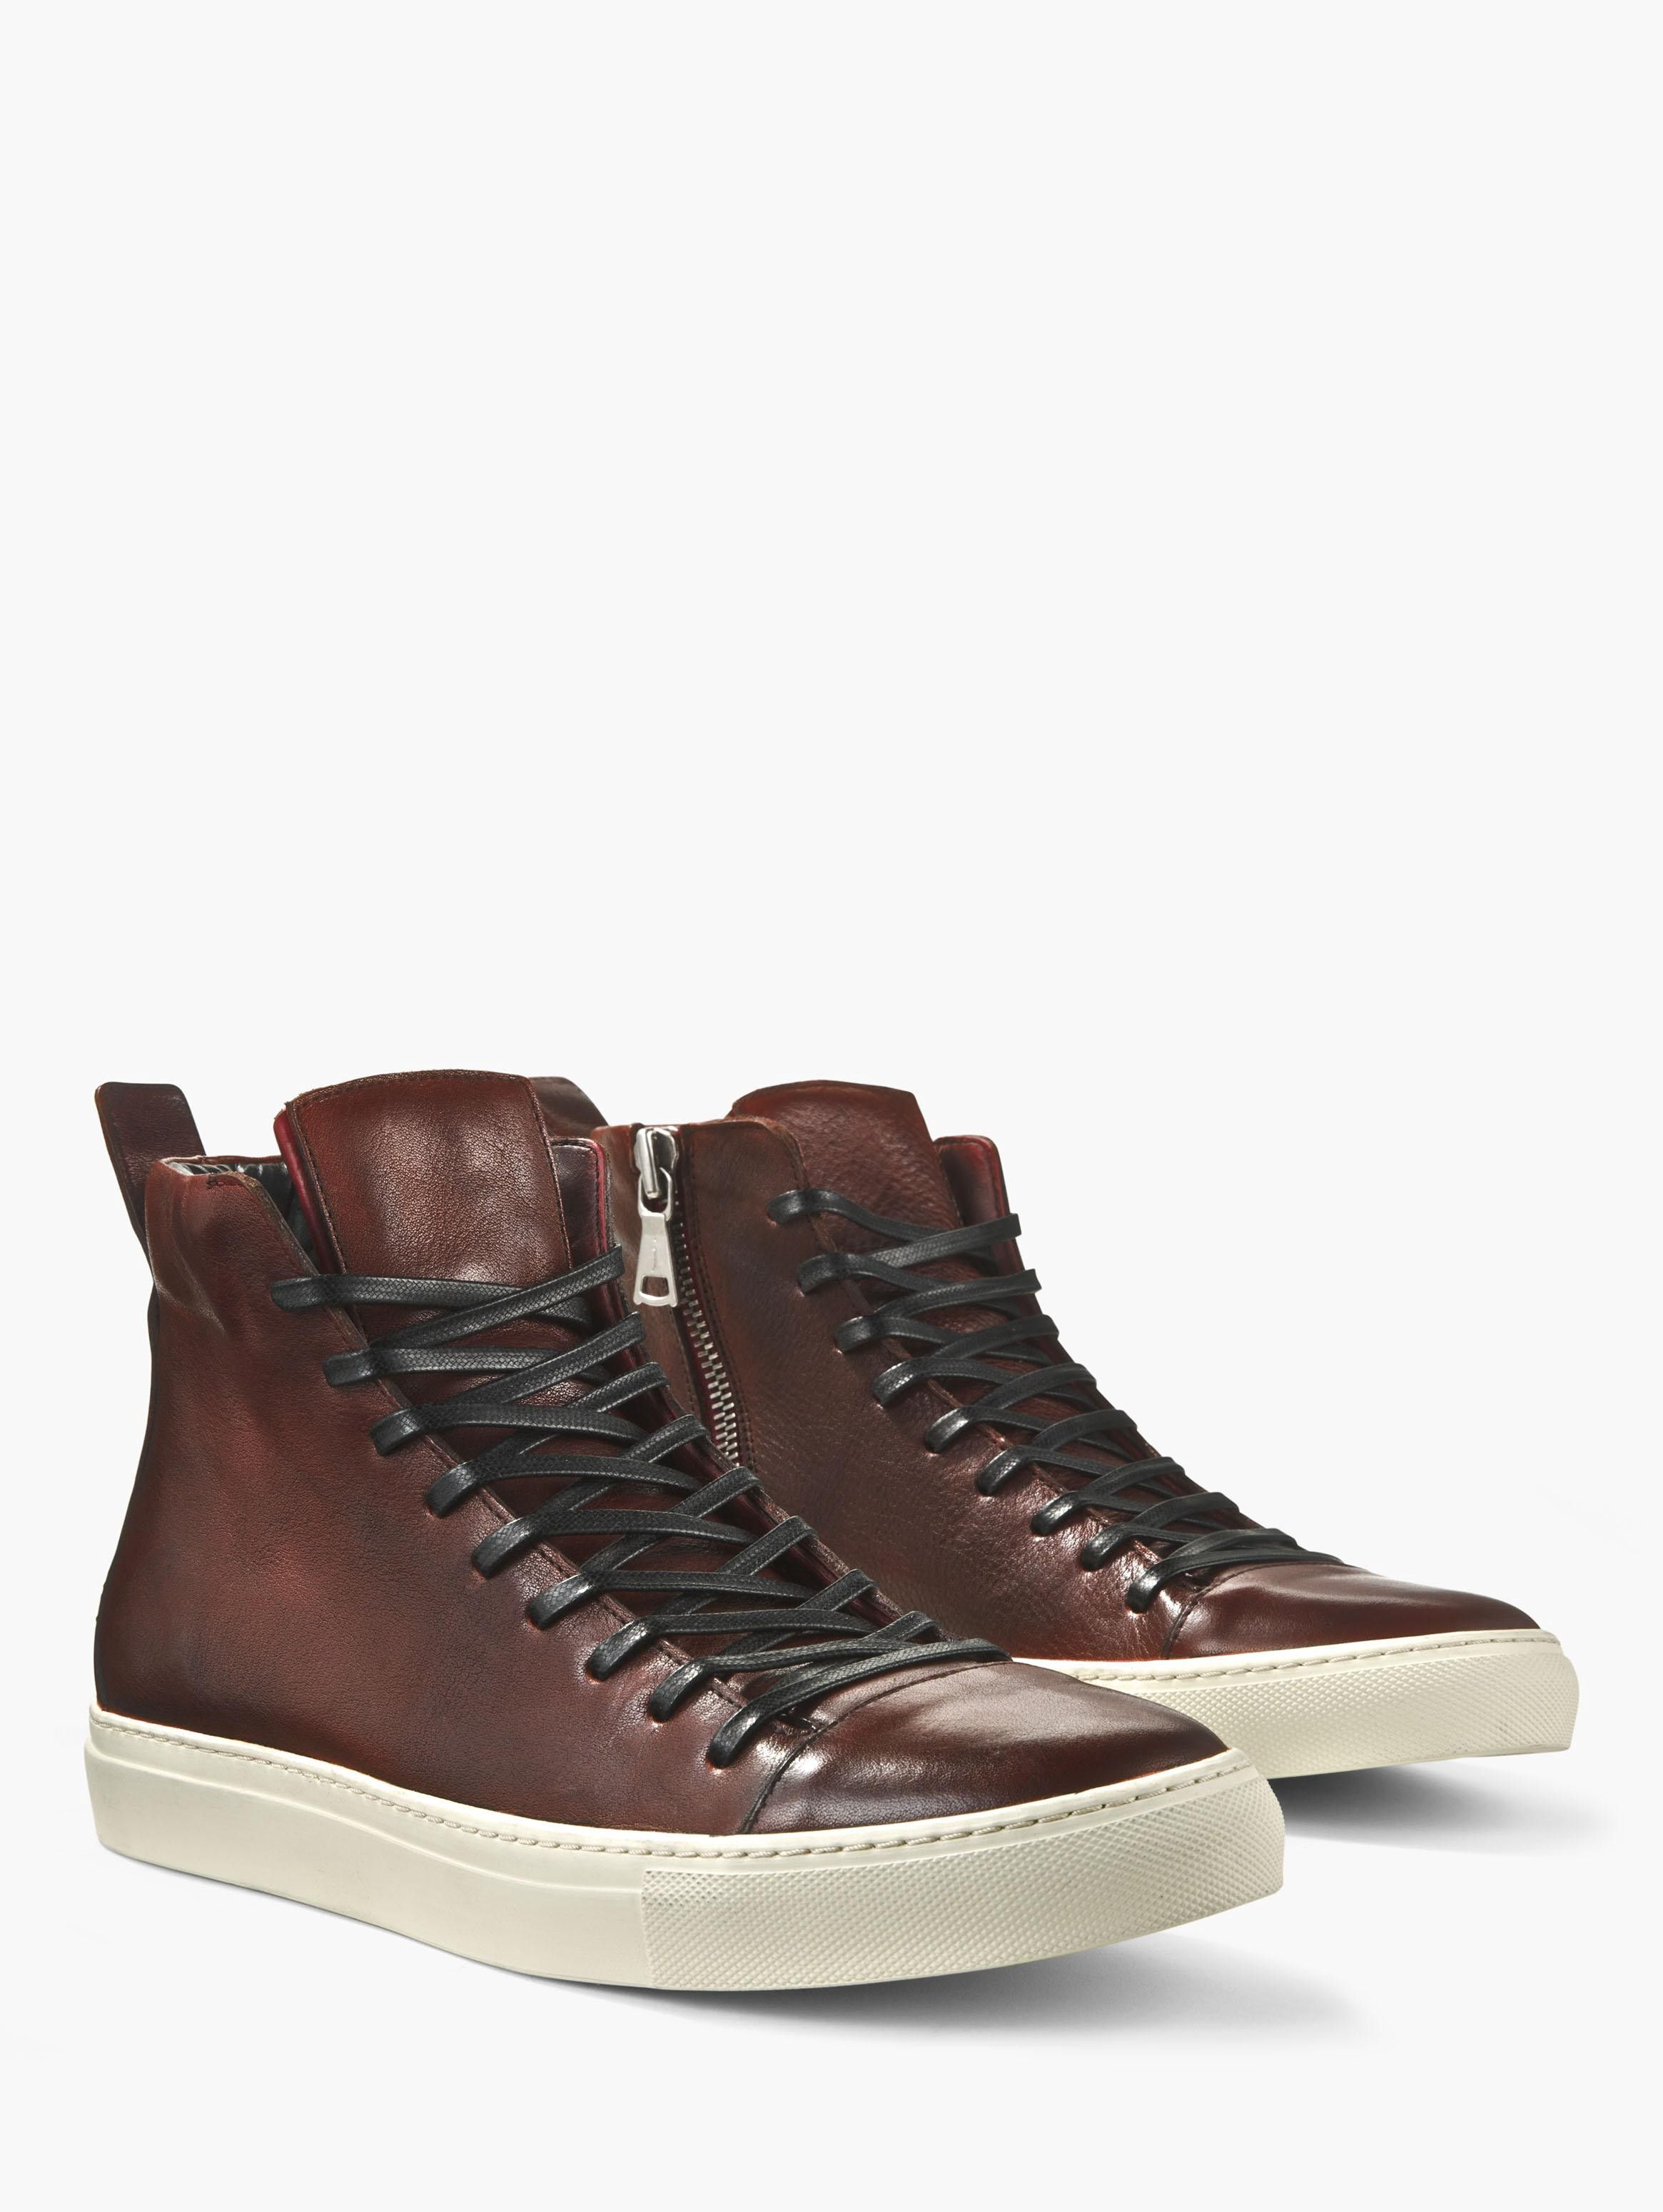 John Varvatos Reed Mid Top Sneaker